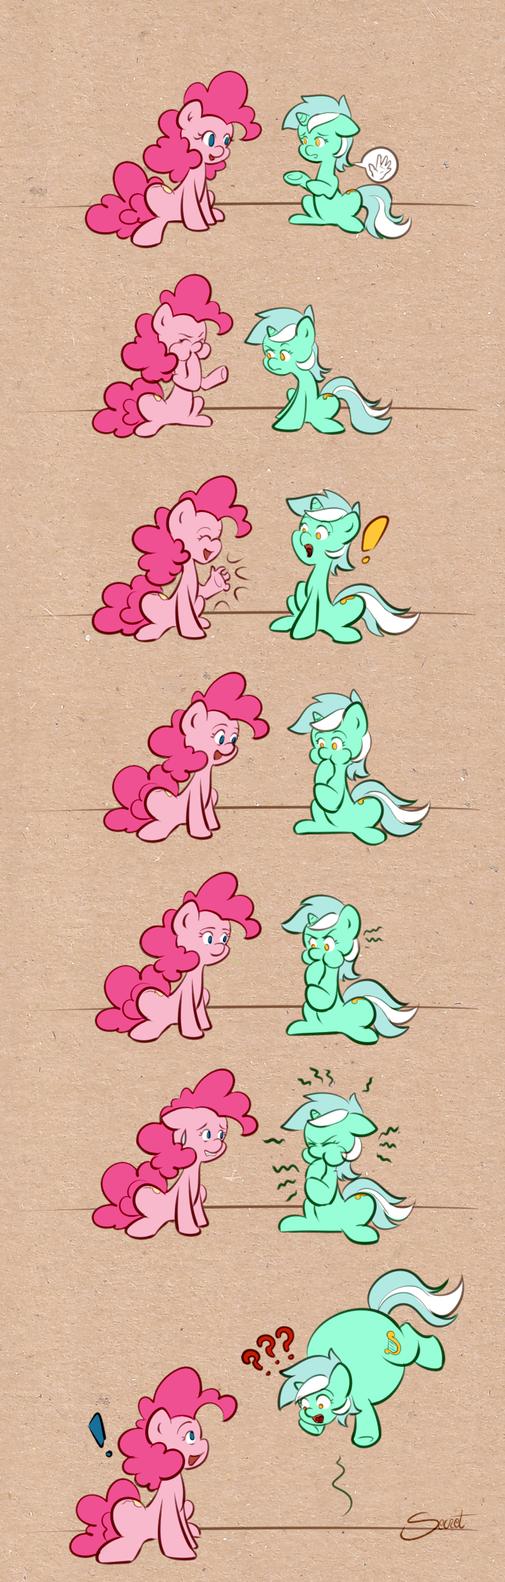 [spoiler]Just blow on it by secret-pony